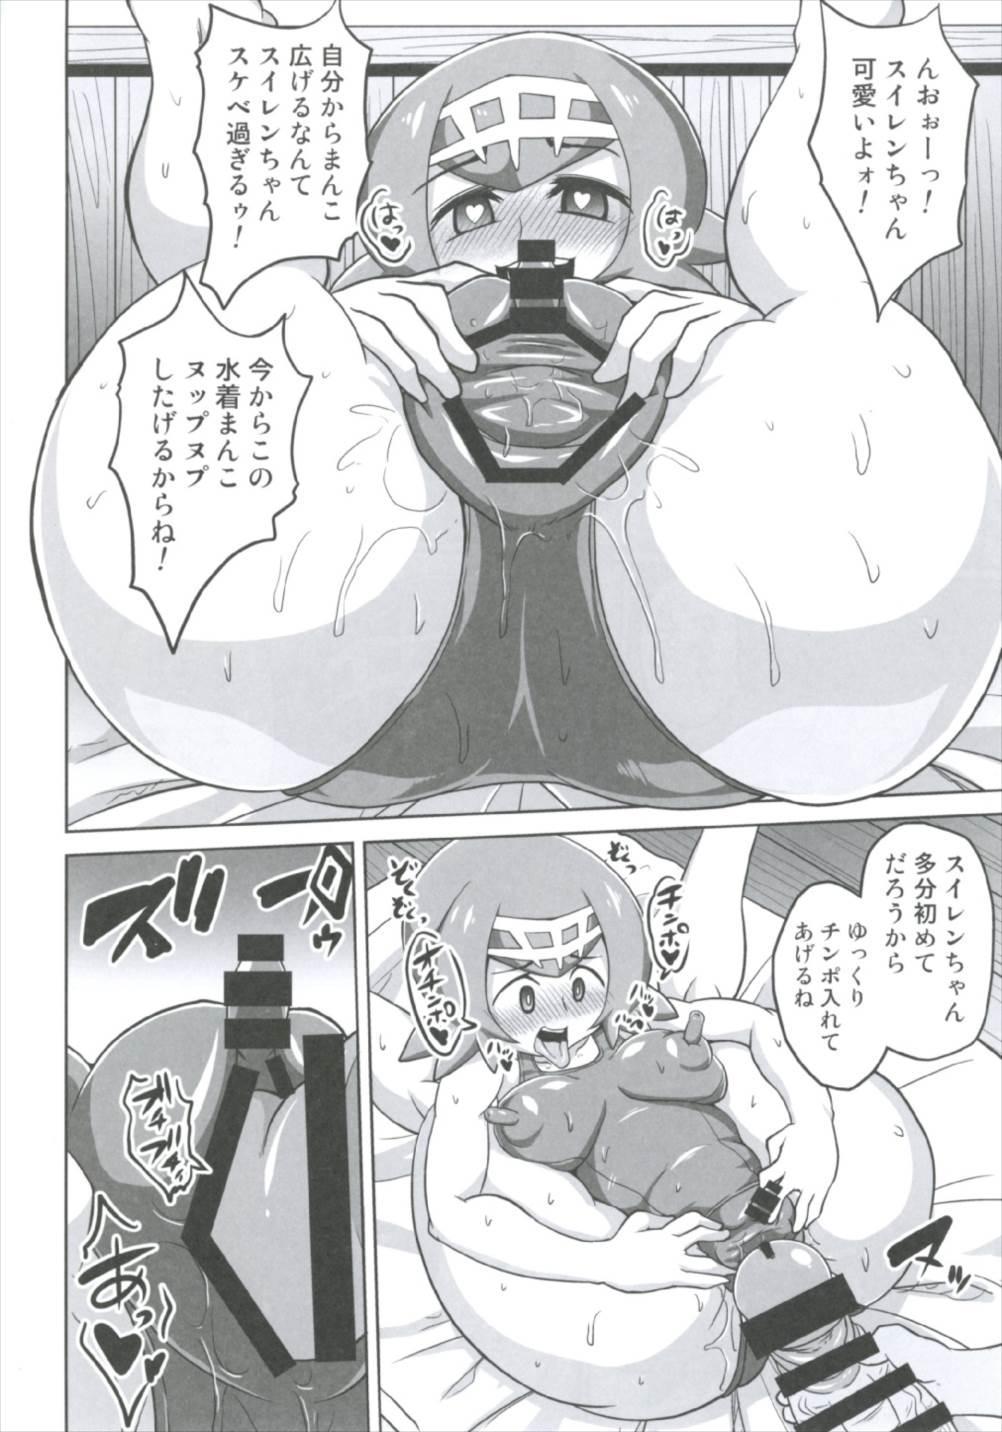 (C92) [Forever and ever (Eisen)] BOKKIMON -Suiren-chan wa H ni Kyoumi Shinshin- (Pokémon Sun and Moon) 21